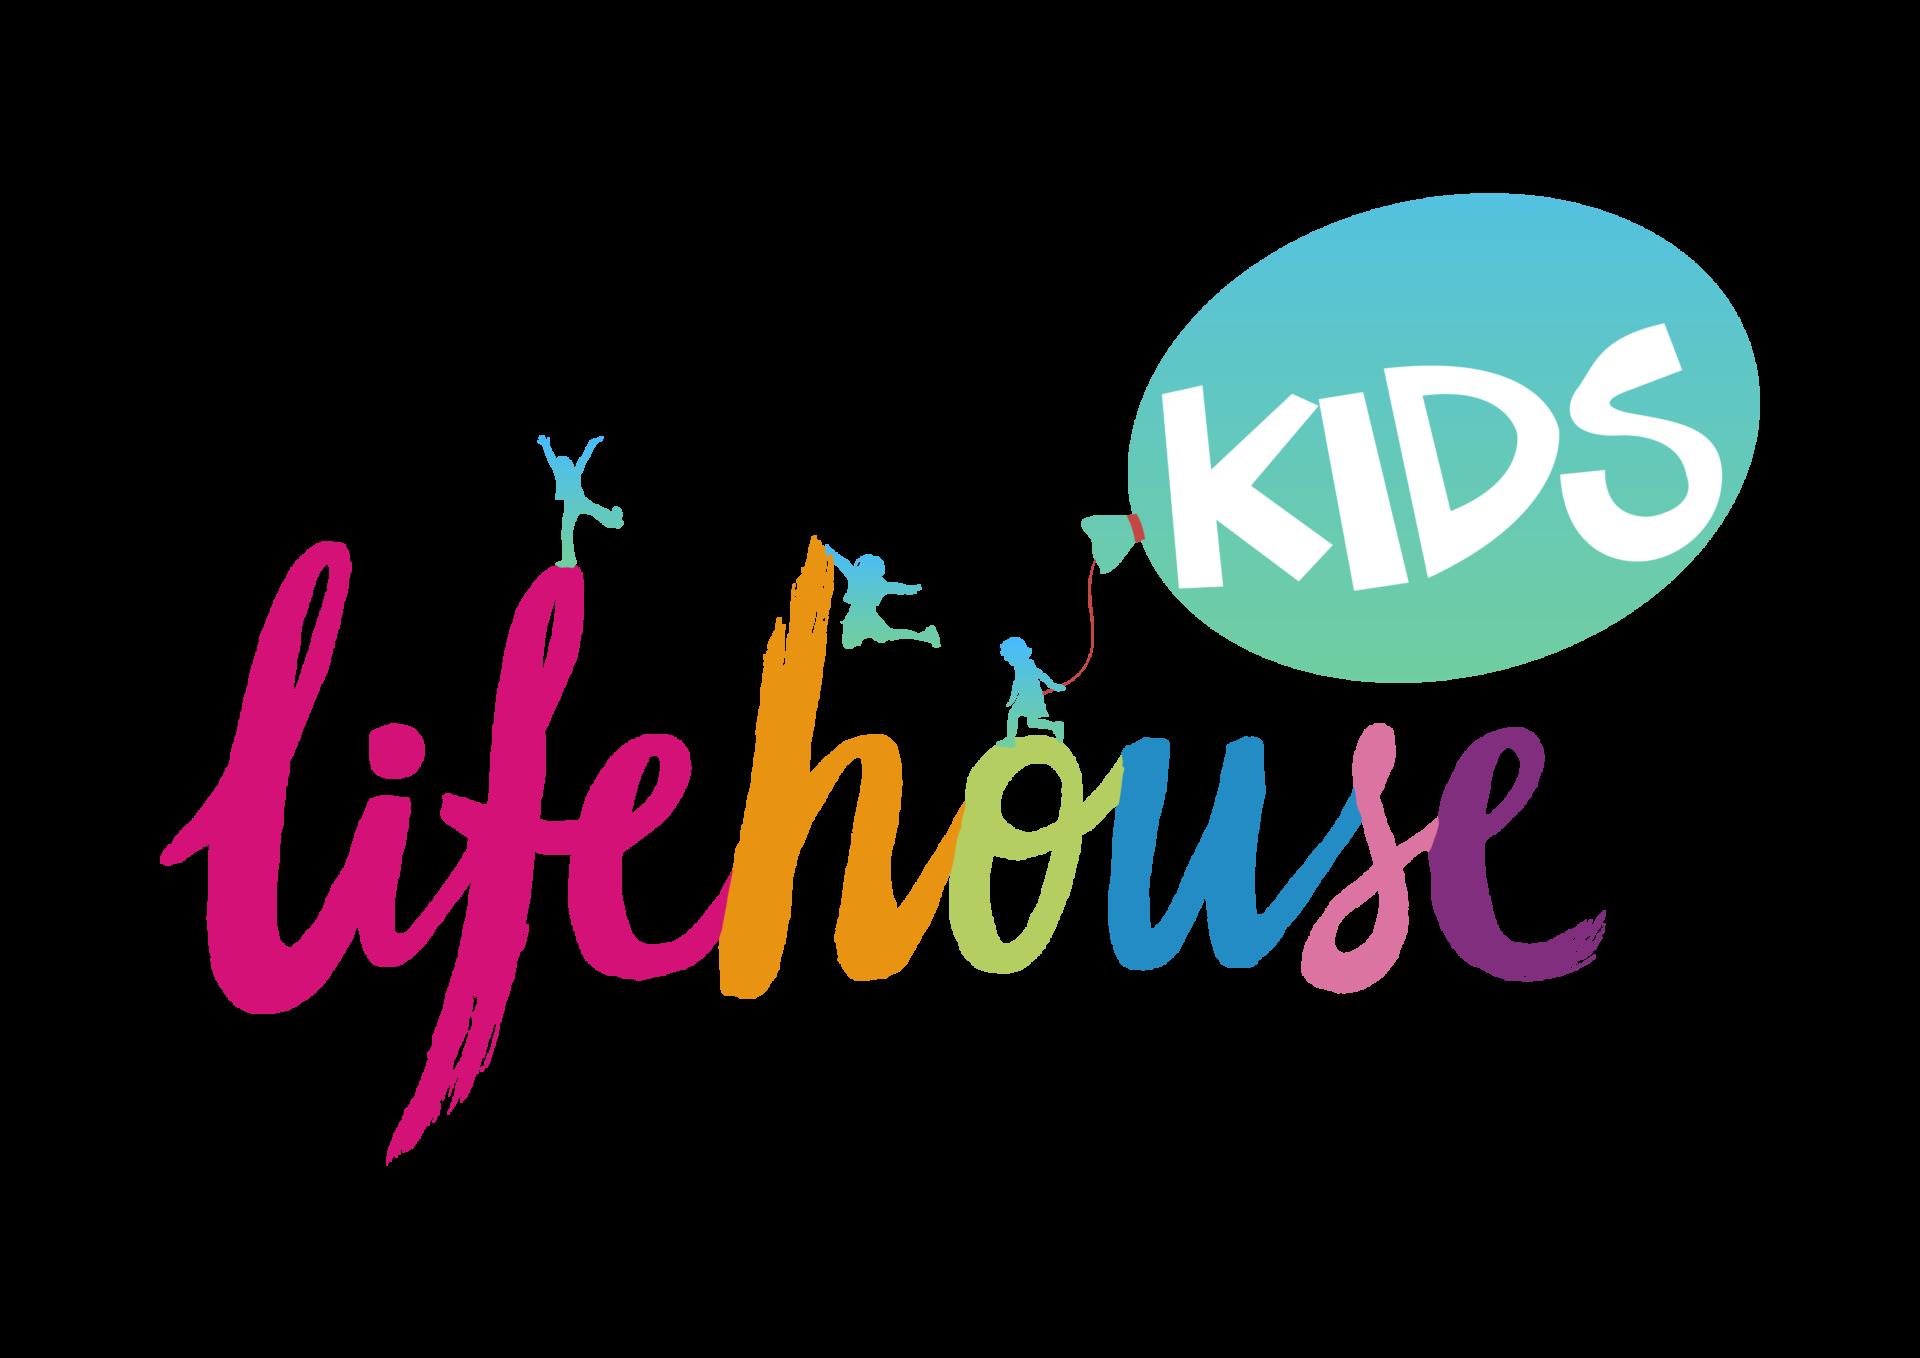 Lifehouse Kids, international kids program in Tokyo